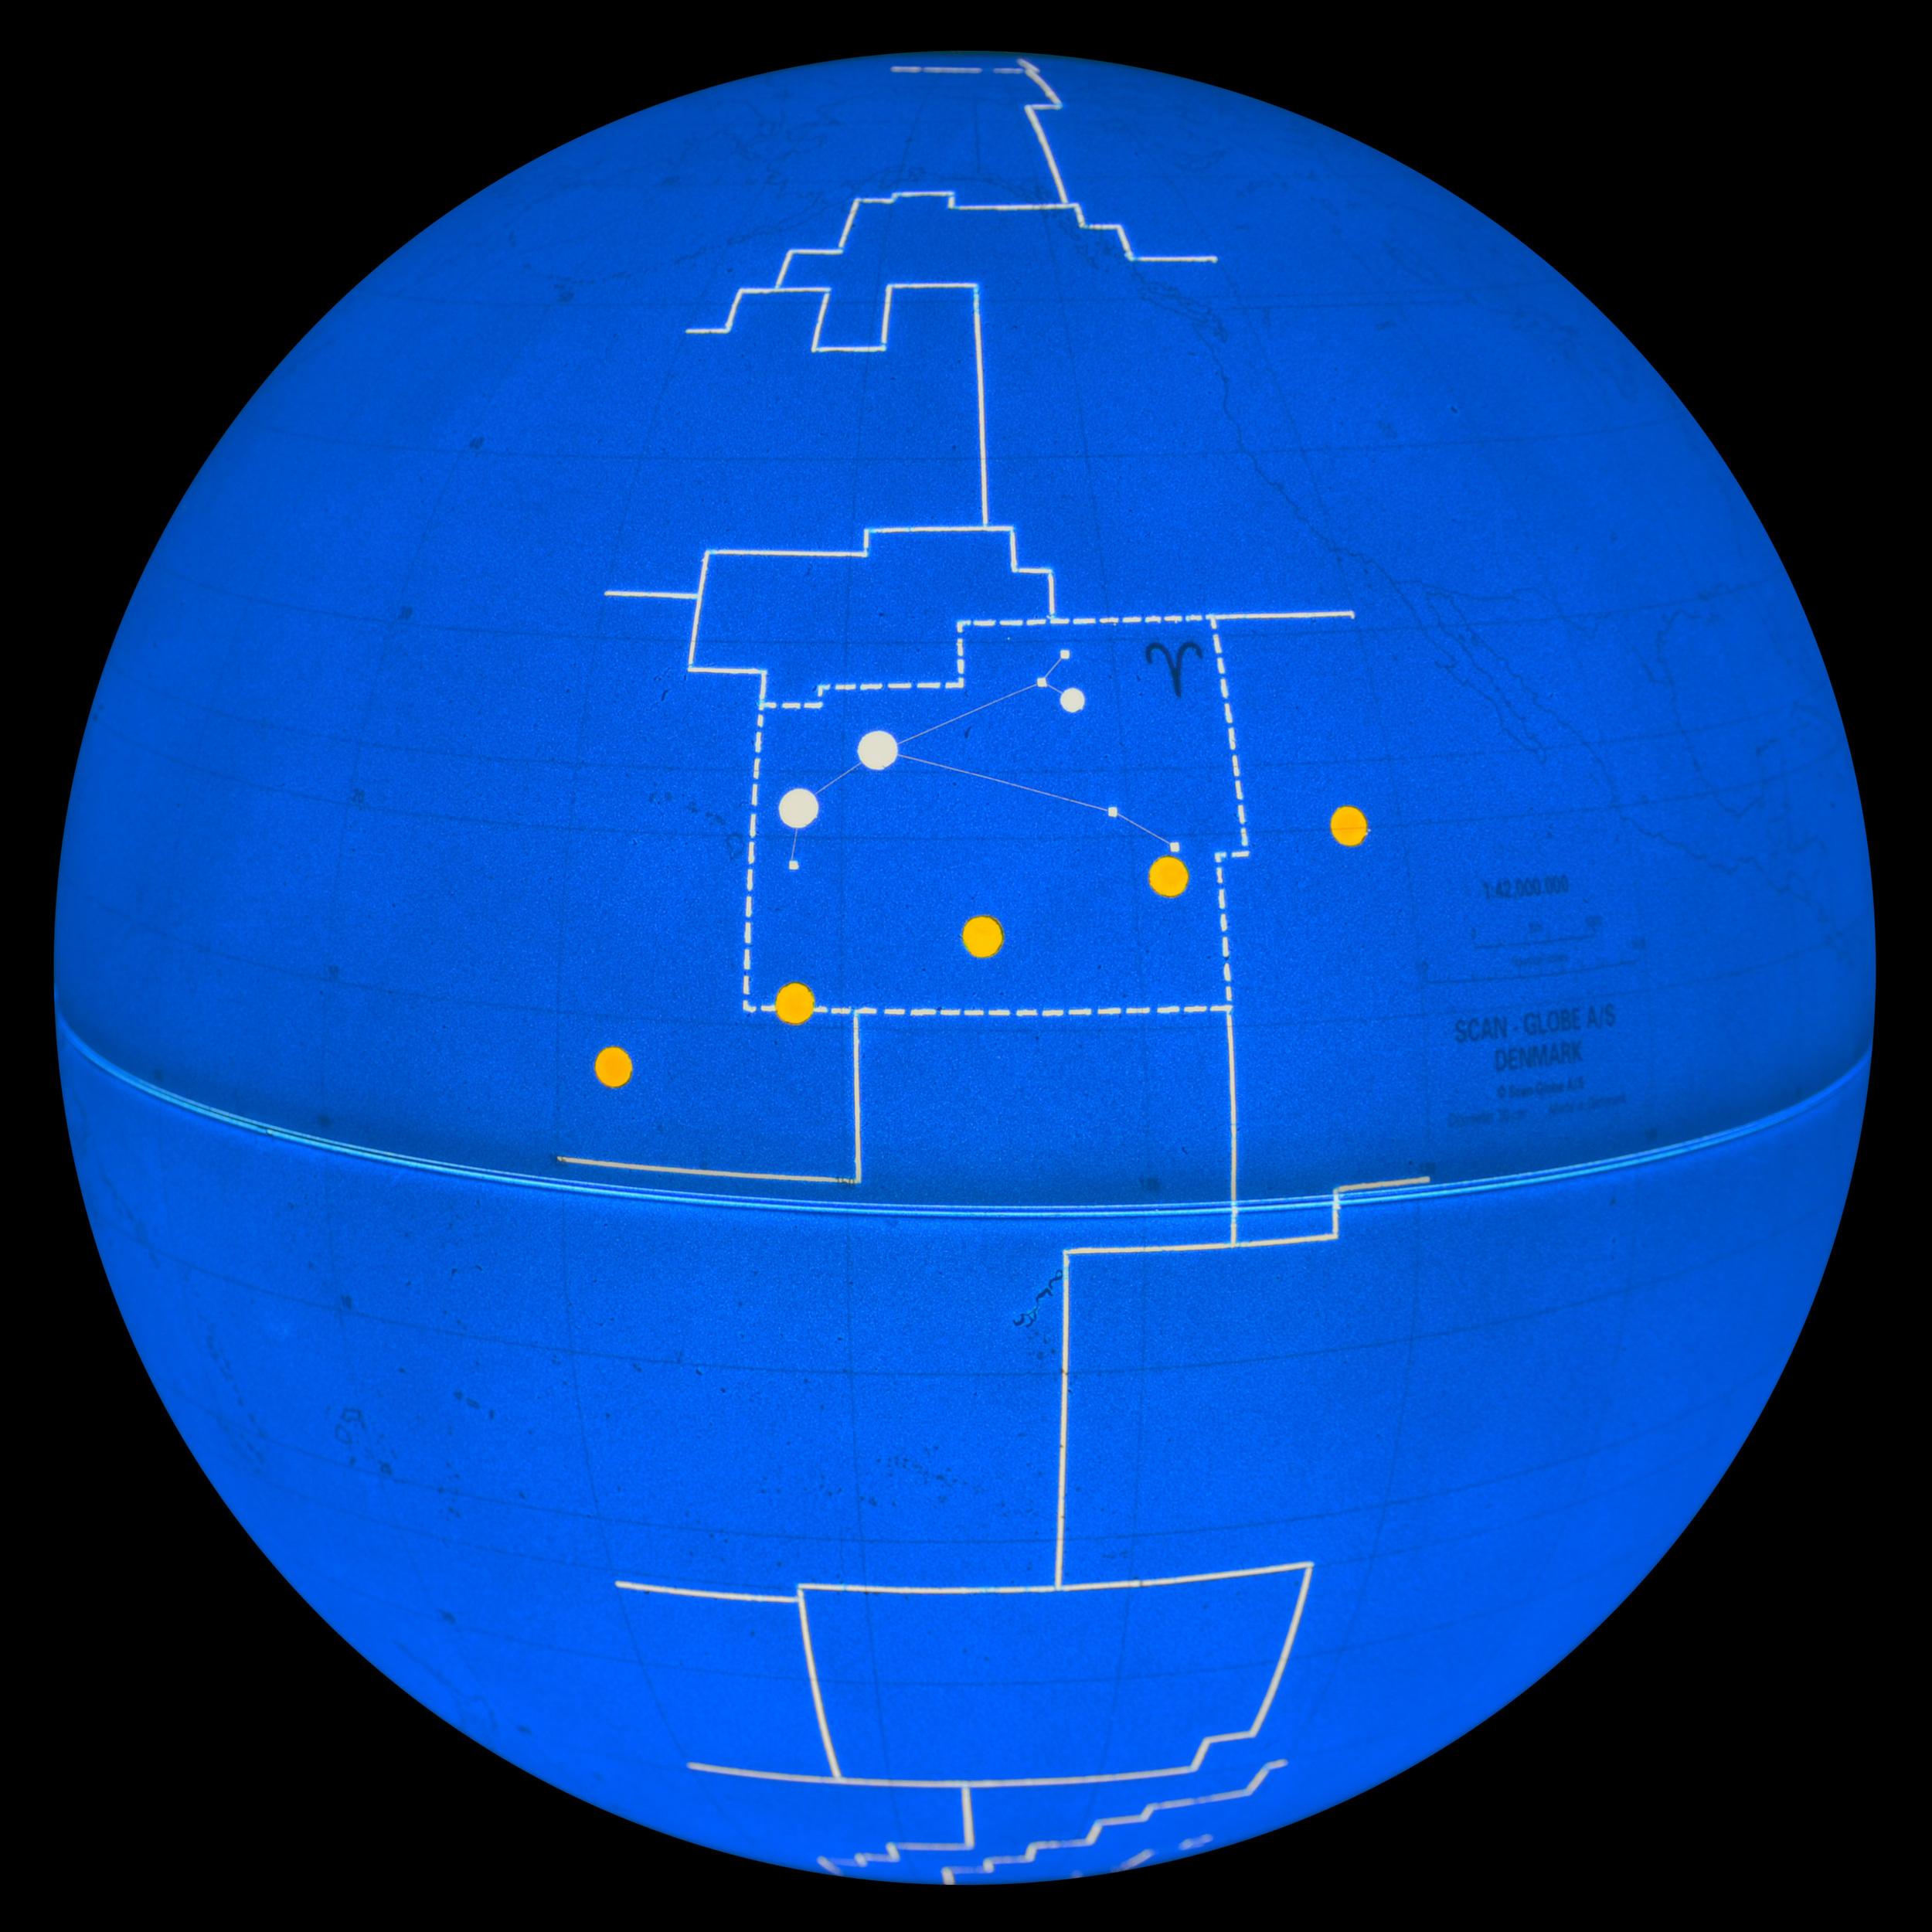 345-5A_CelestialSphere_HDR4.jpg